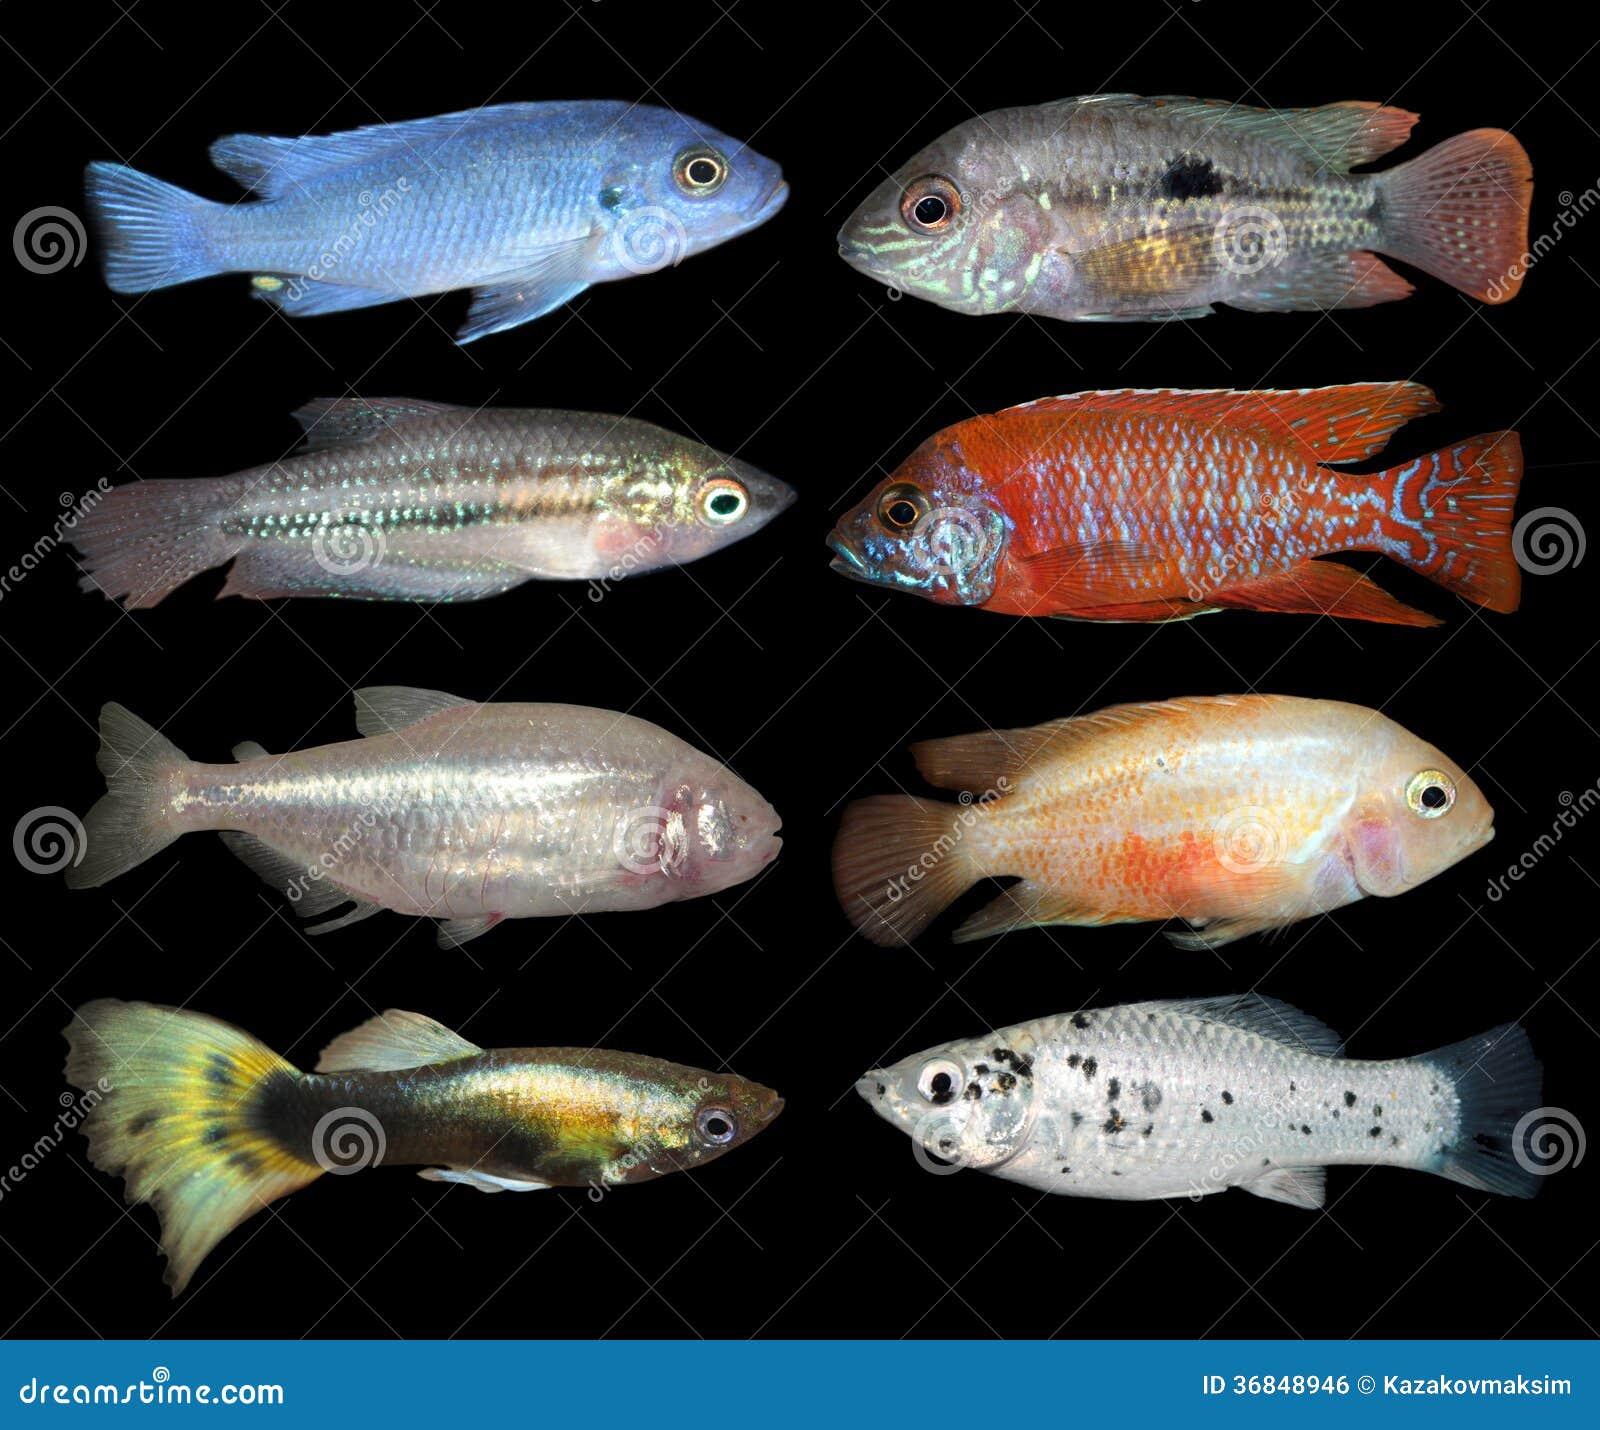 http://thumbs.dreamstime.com/z/set-aquarium-fishes-black-background-cichlids-tetra-acara-gourami-molly-astyanax-guppy-36848946.jpg